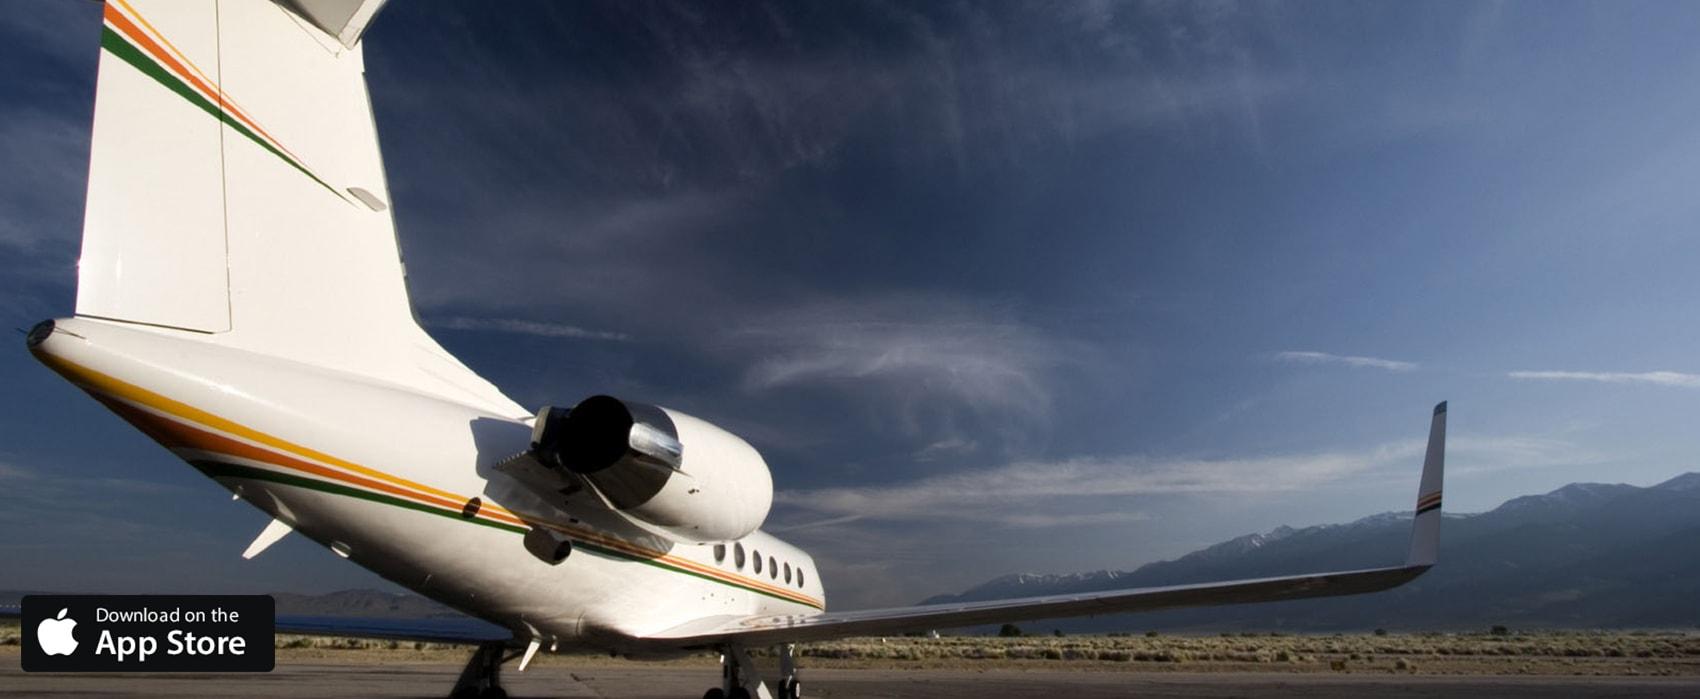 Private Jet Charter Rental  Aircraft Charter Services  ZephyrJets